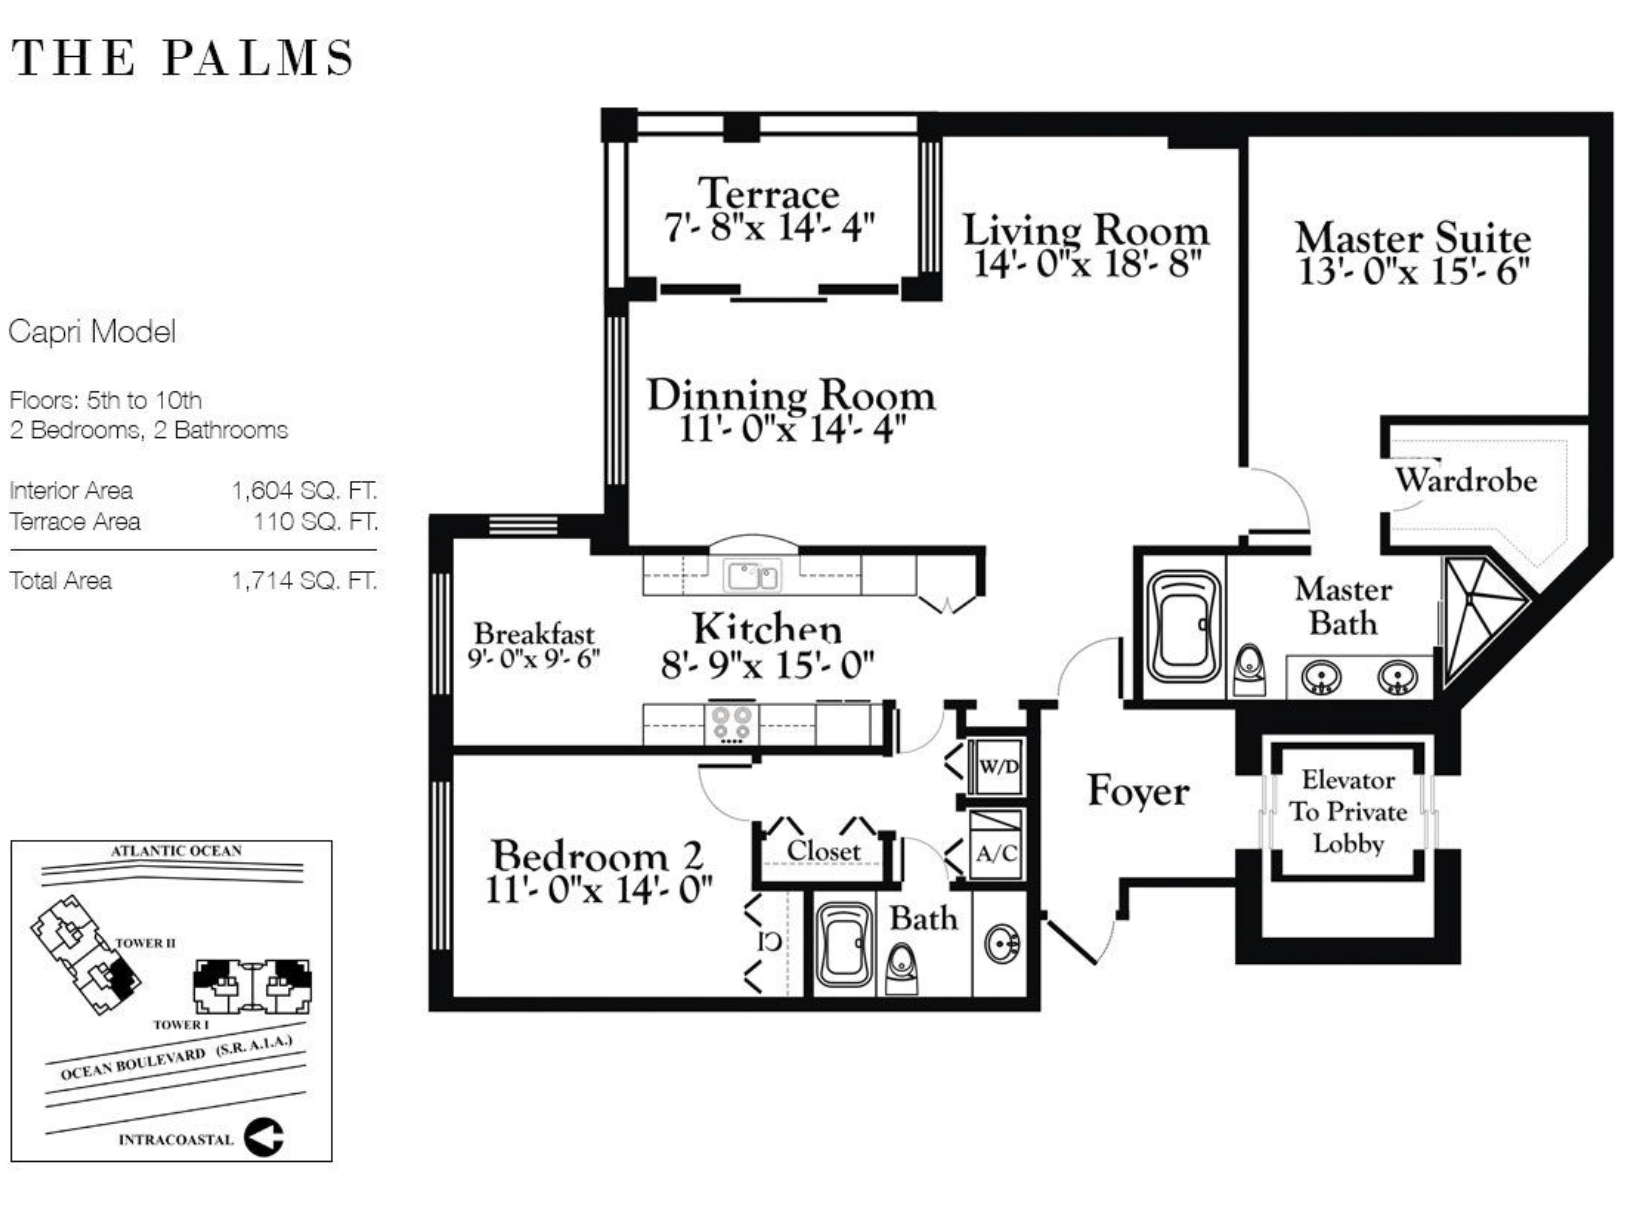 The Palms Fort Lauderdale | Floor Plan Capri